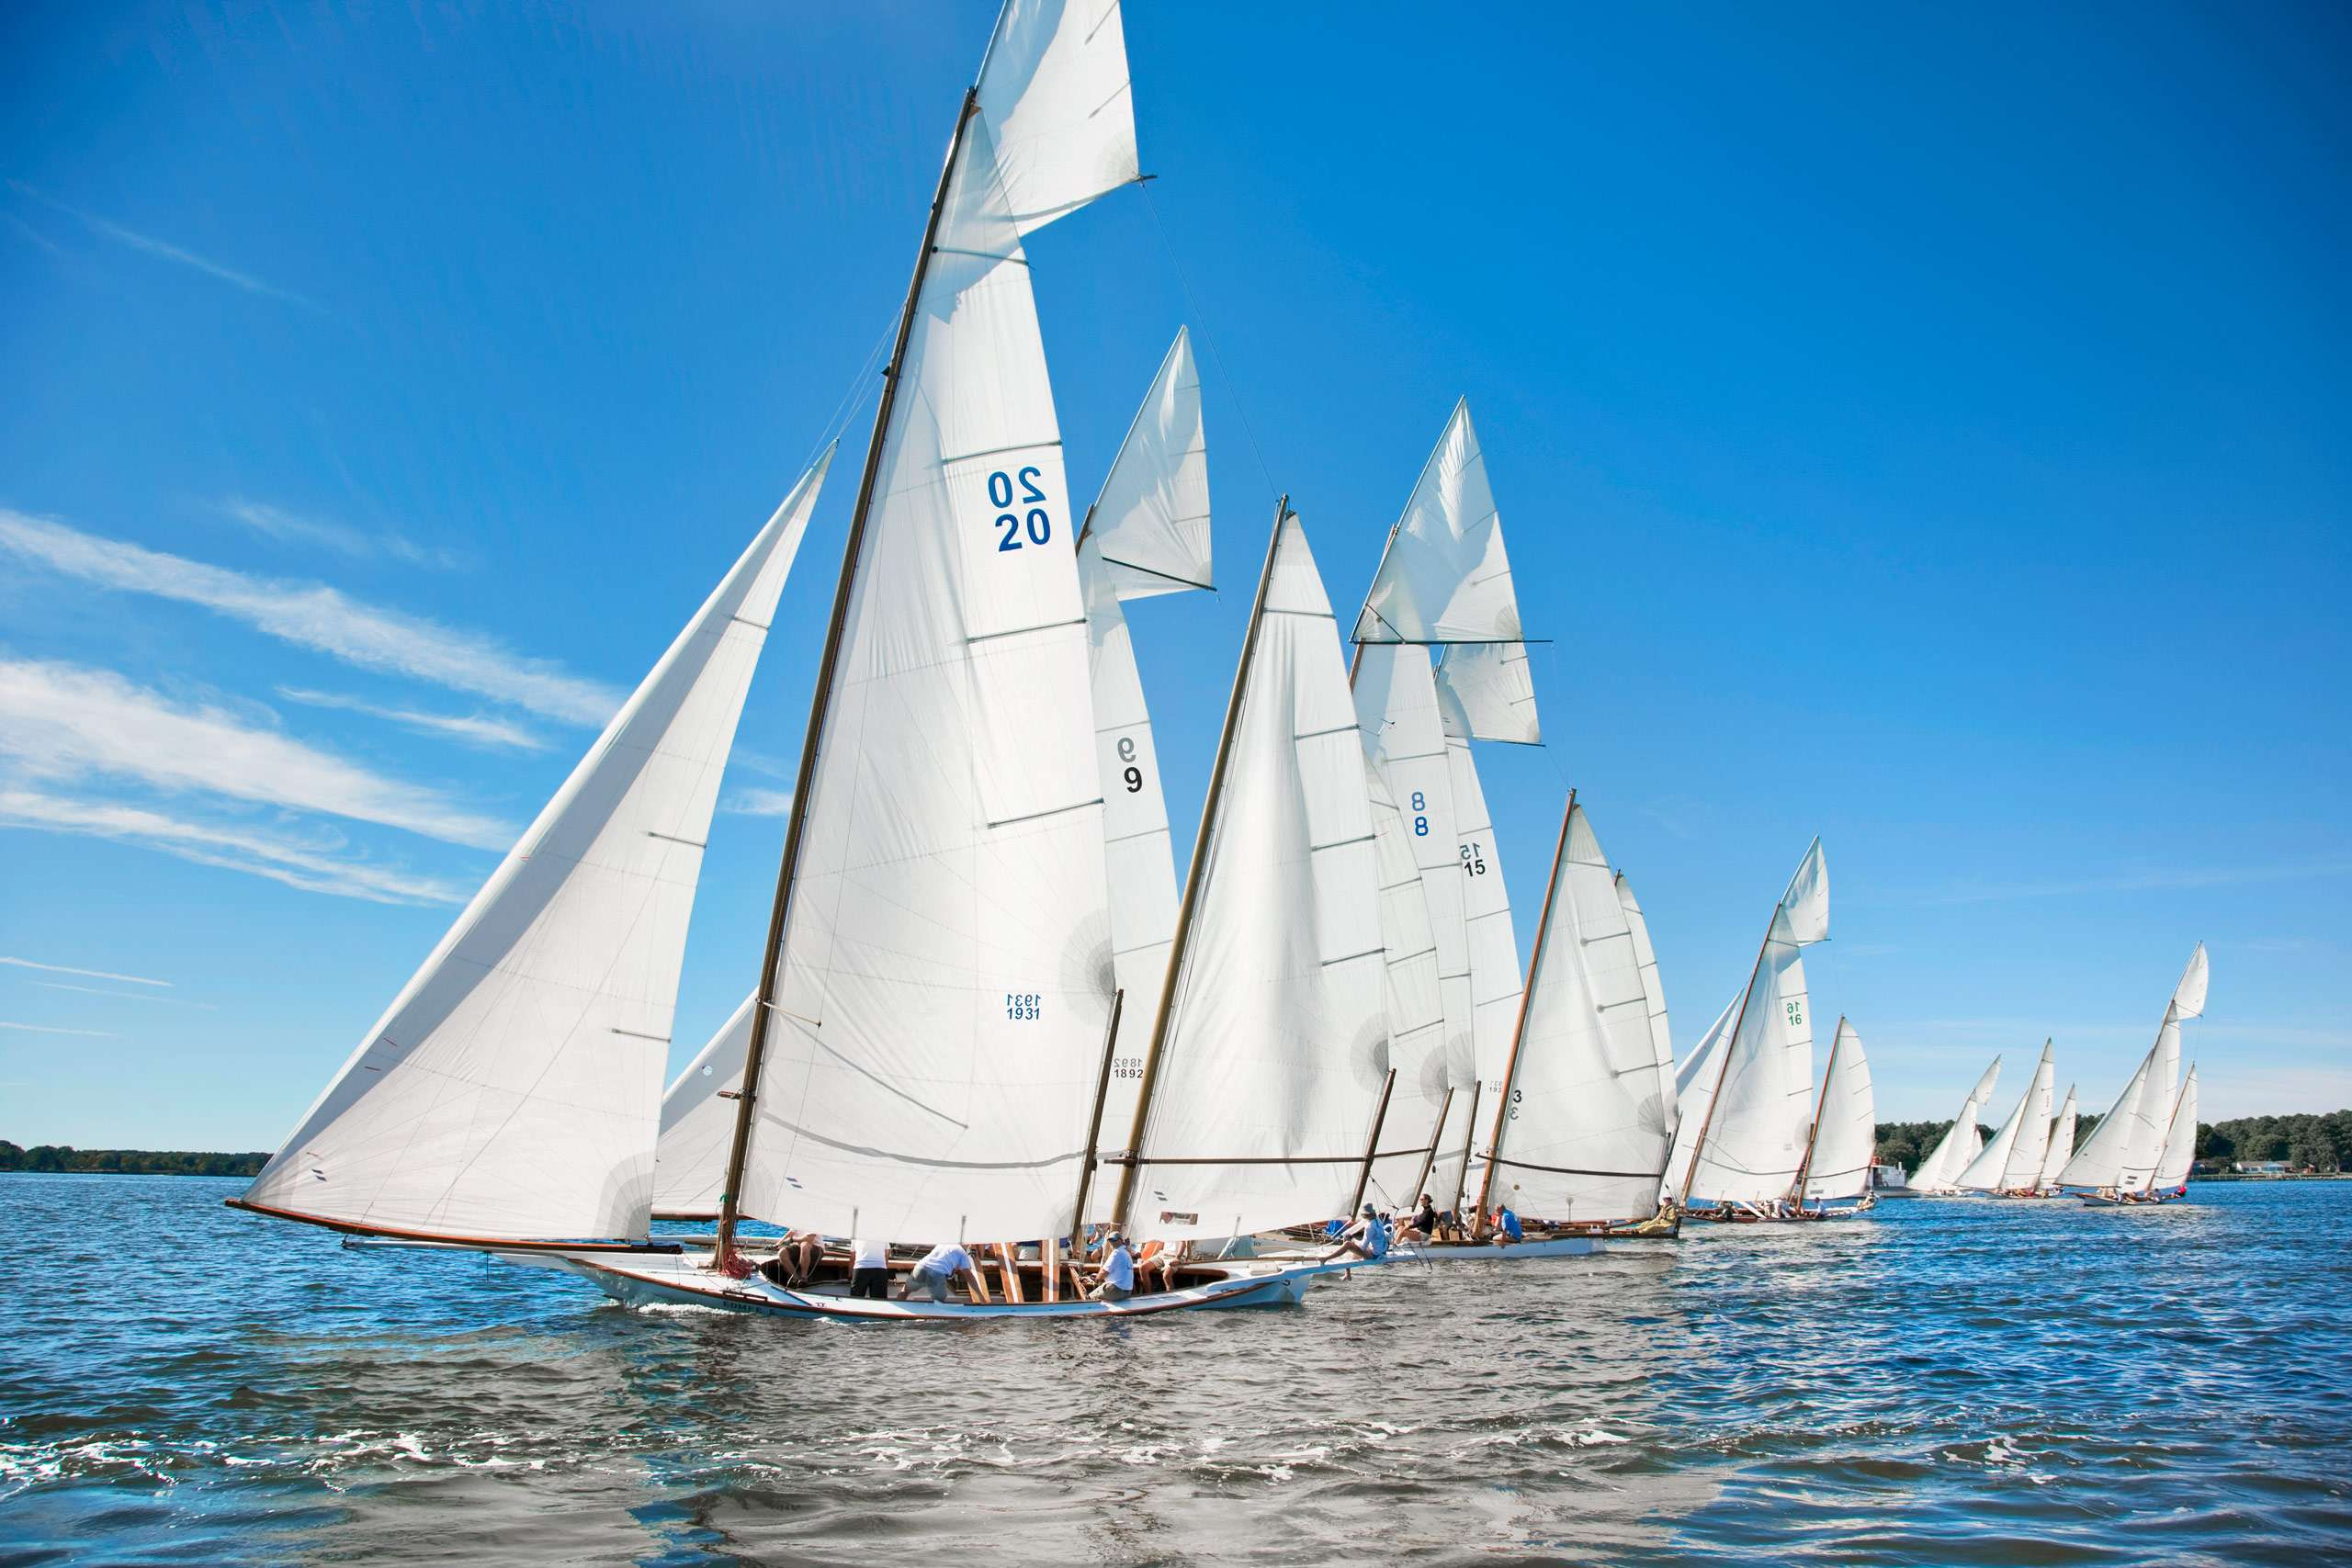 PORTFOLIO - Sailing - Log Canoes #6   PCG525